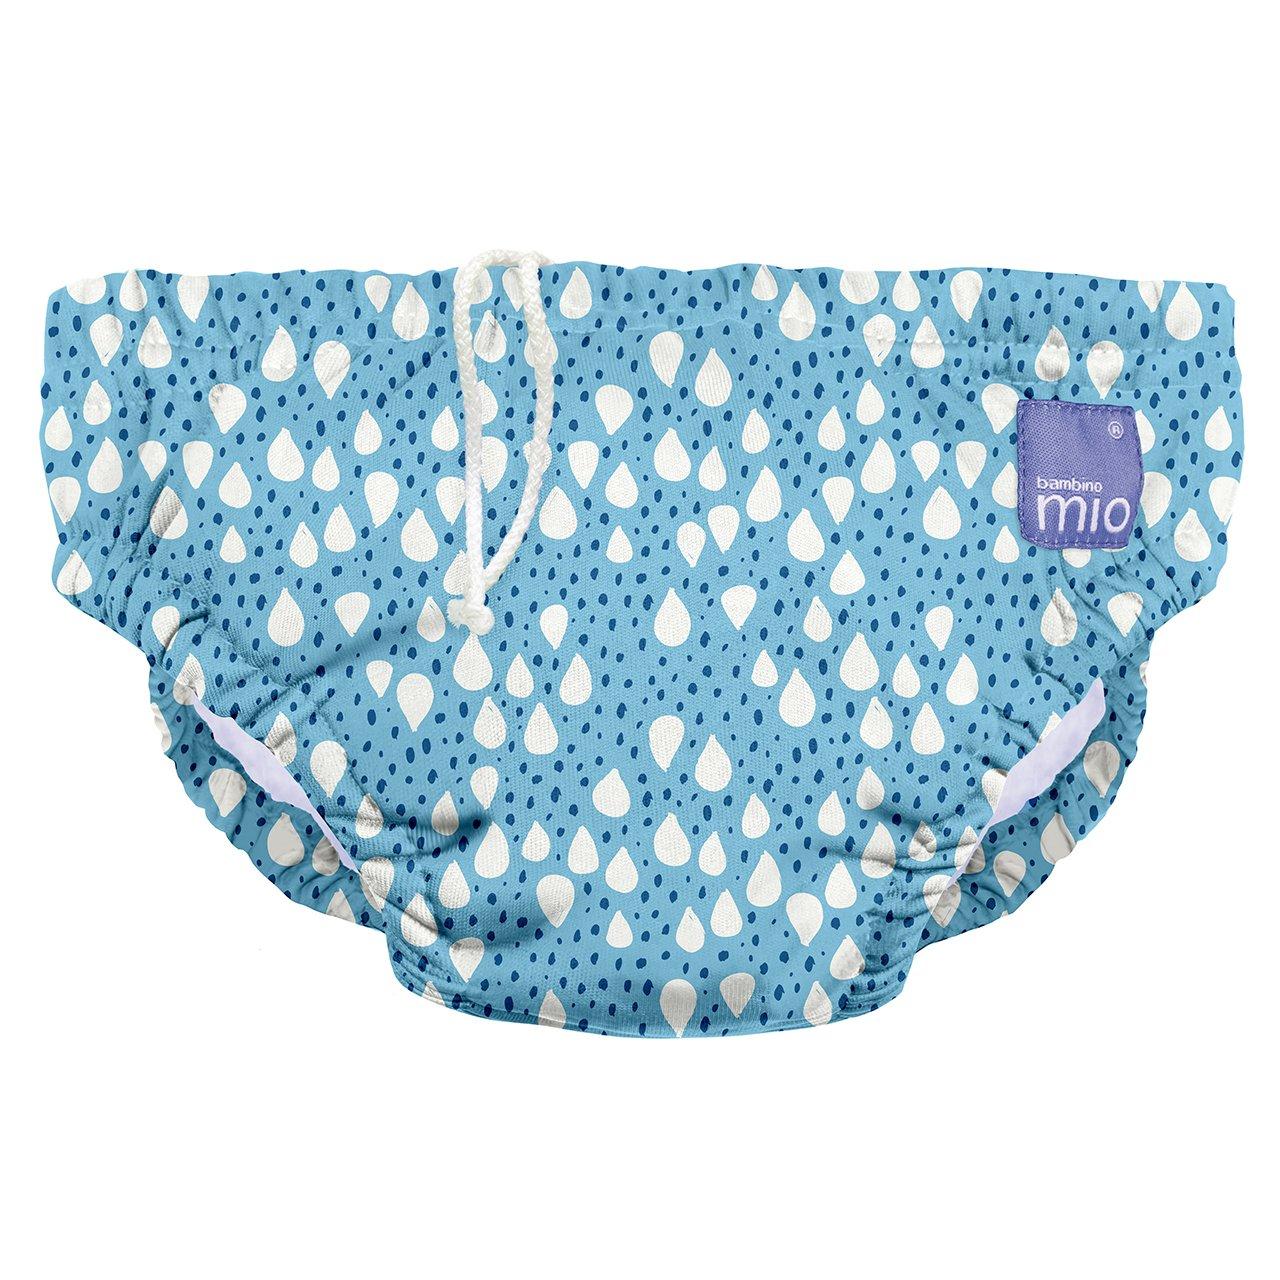 Bambino Mio Reusable Swim Nappy, 0 to 6 Months, Ocean Drop Bambino Mio UK SWPS OCE